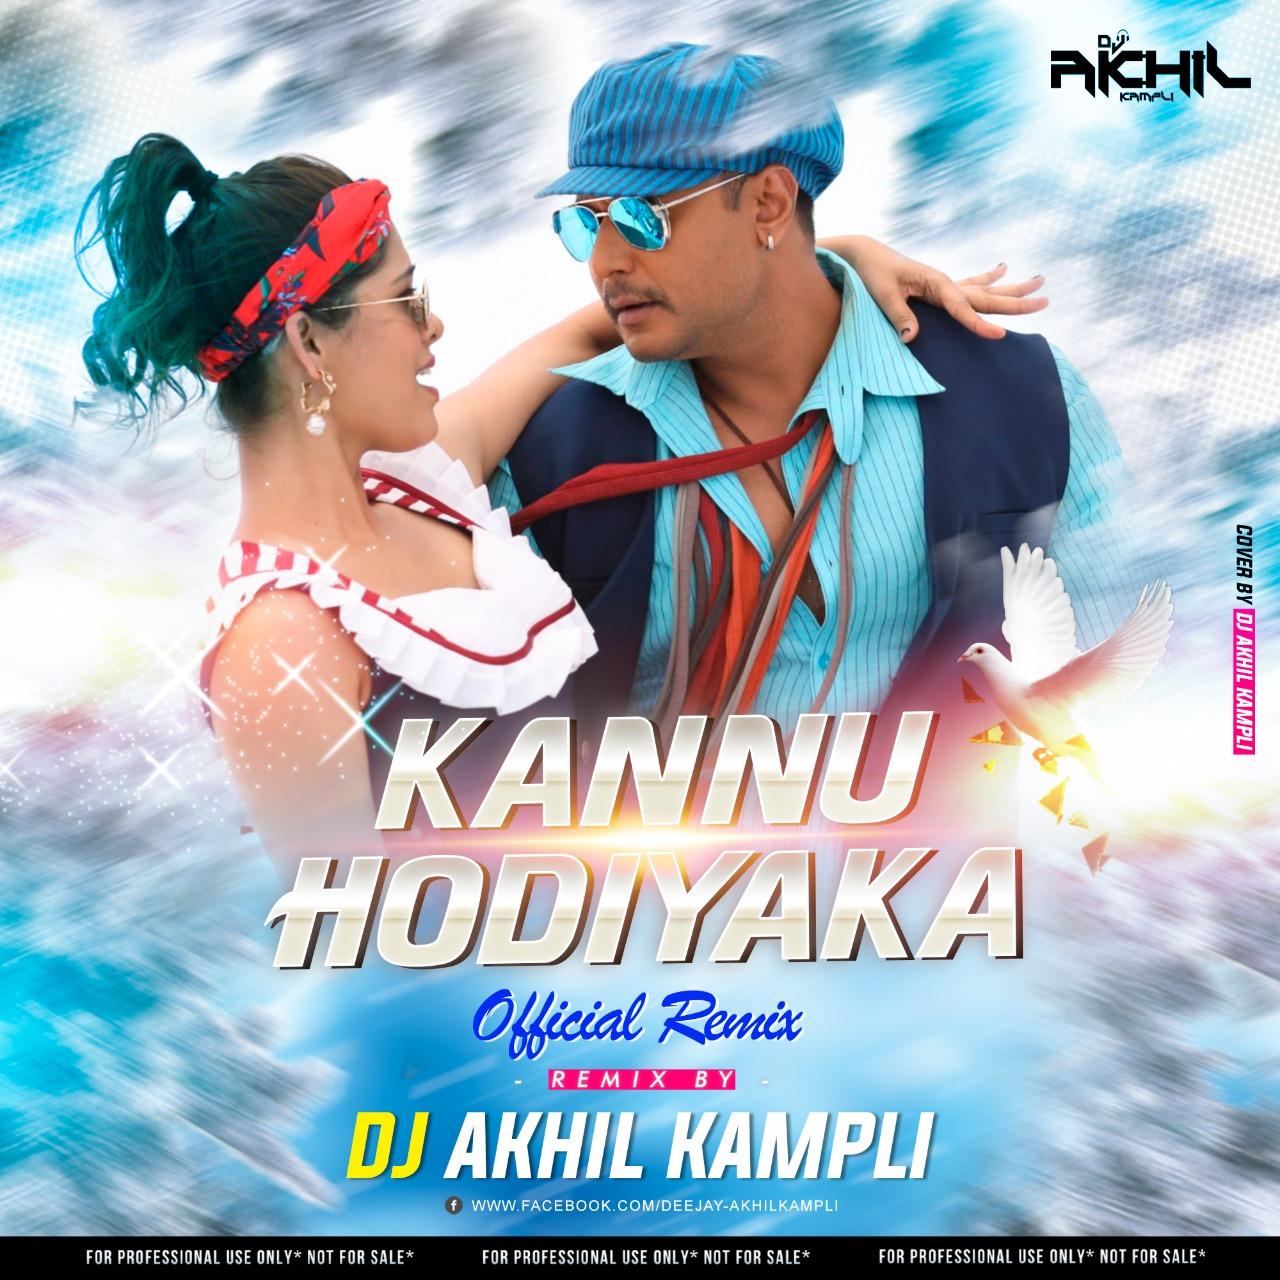 Kannu Hodiyaka Official Remix Dj Akhil Kampli